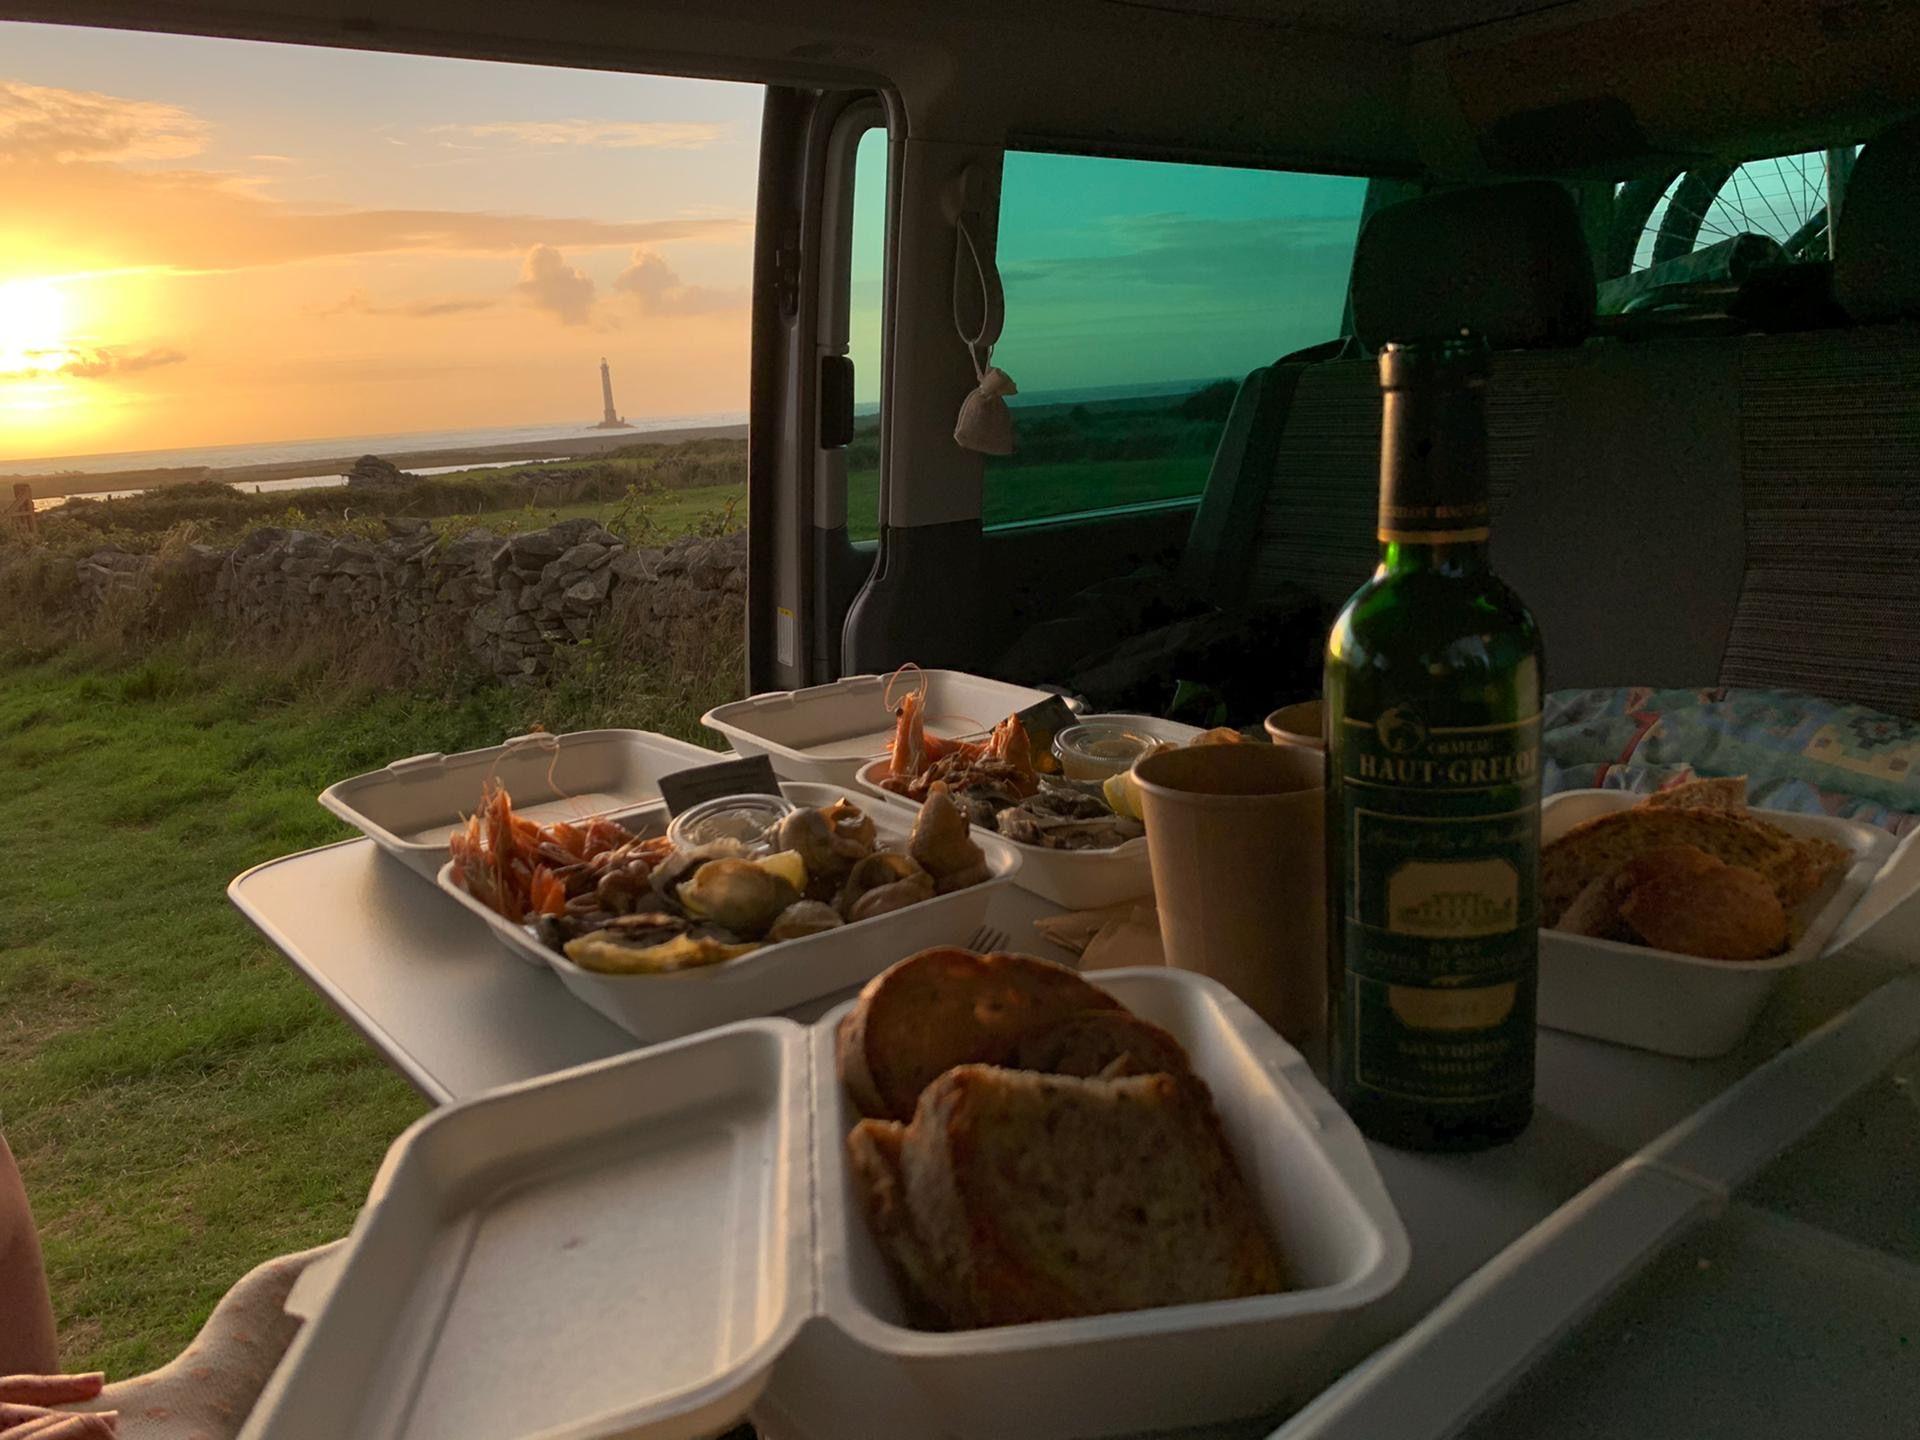 la vie en van, repas du soir au soleil couchant